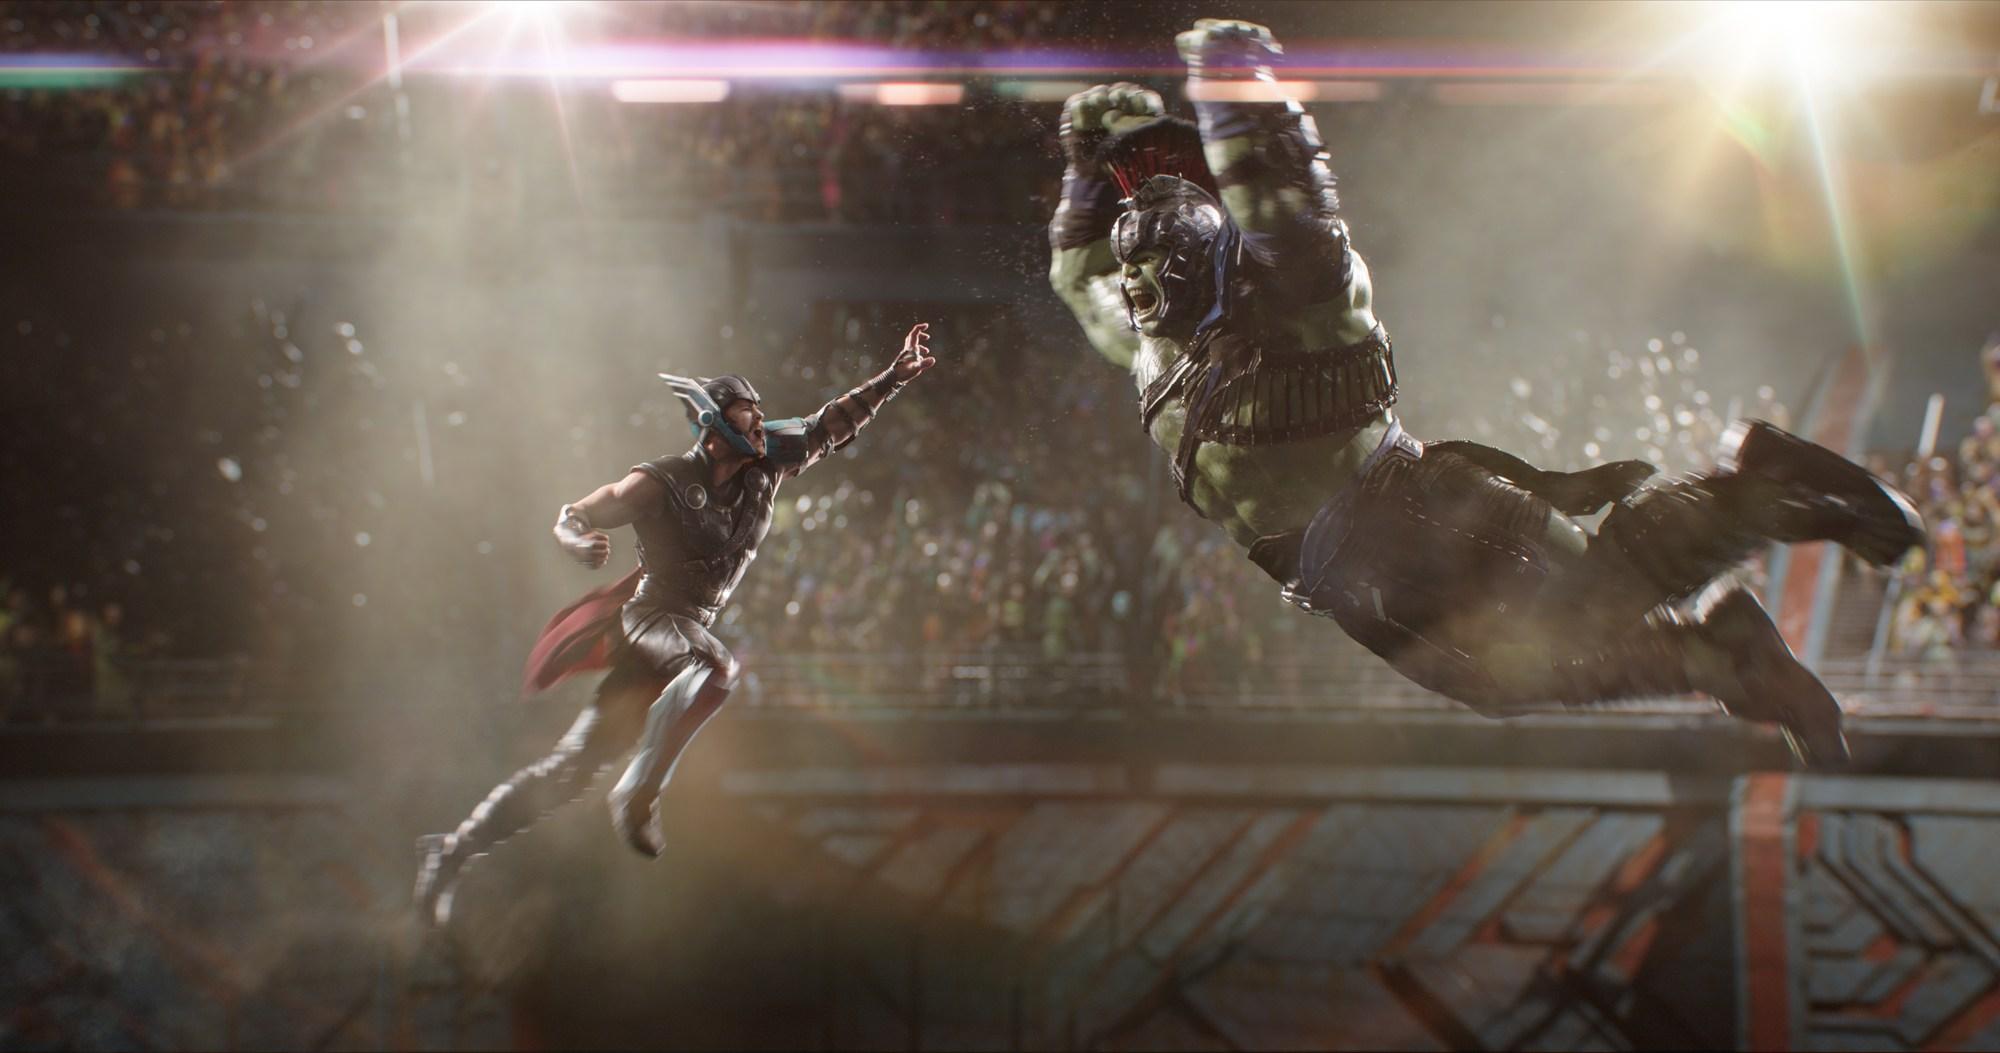 35. Thor Ragnarok